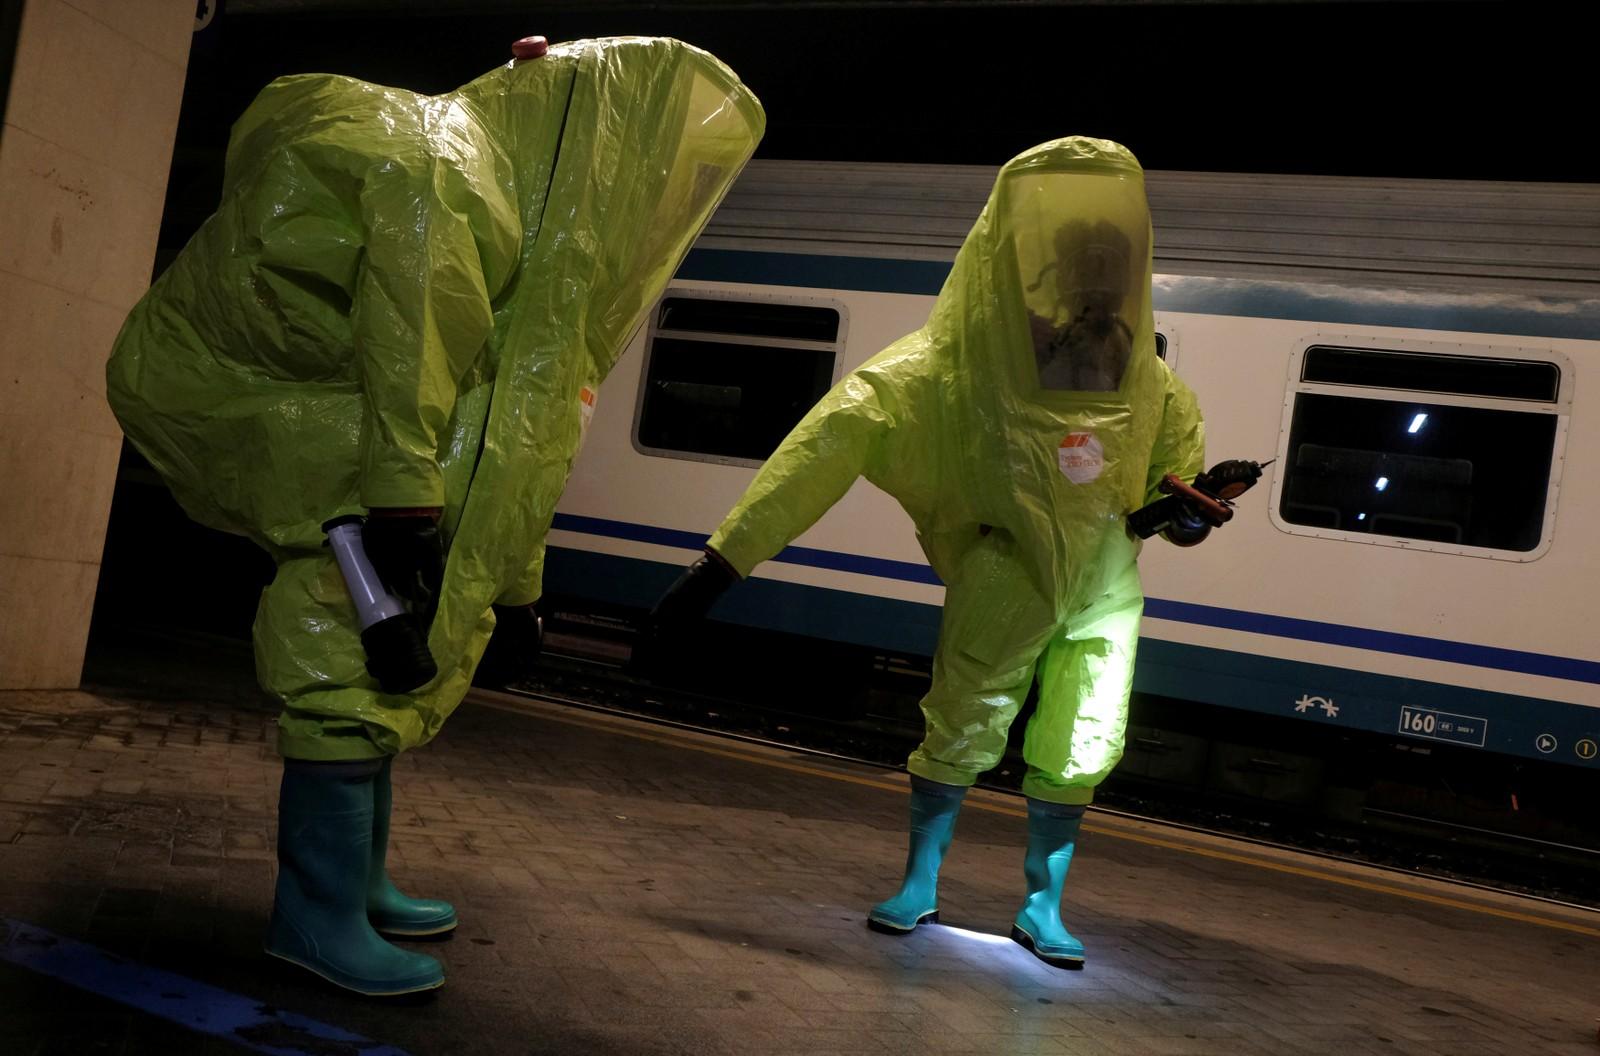 Anti-terror-øvelse på en t-bane i Venezia denne uka.